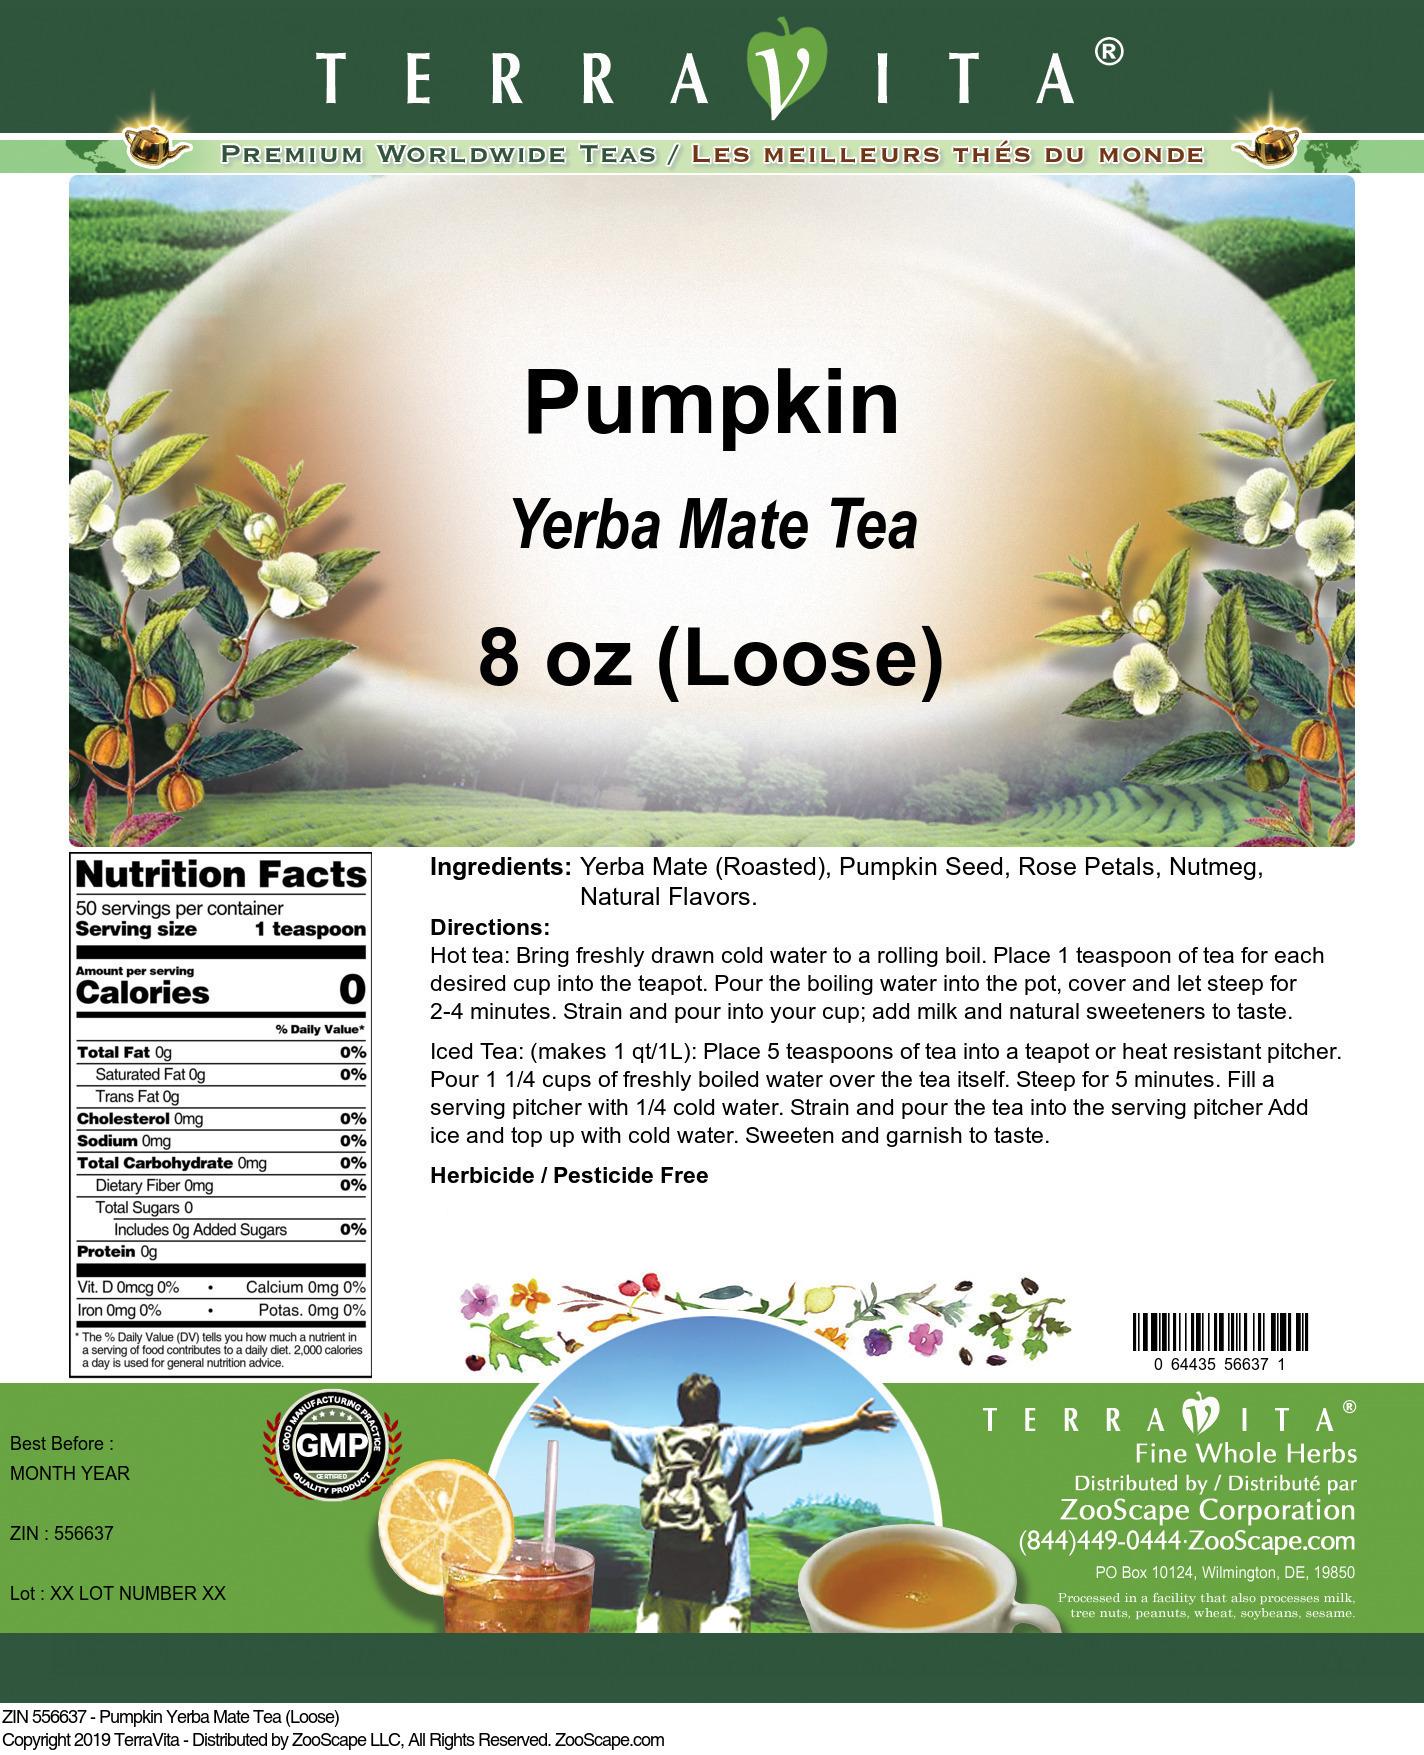 Pumpkin Yerba Mate